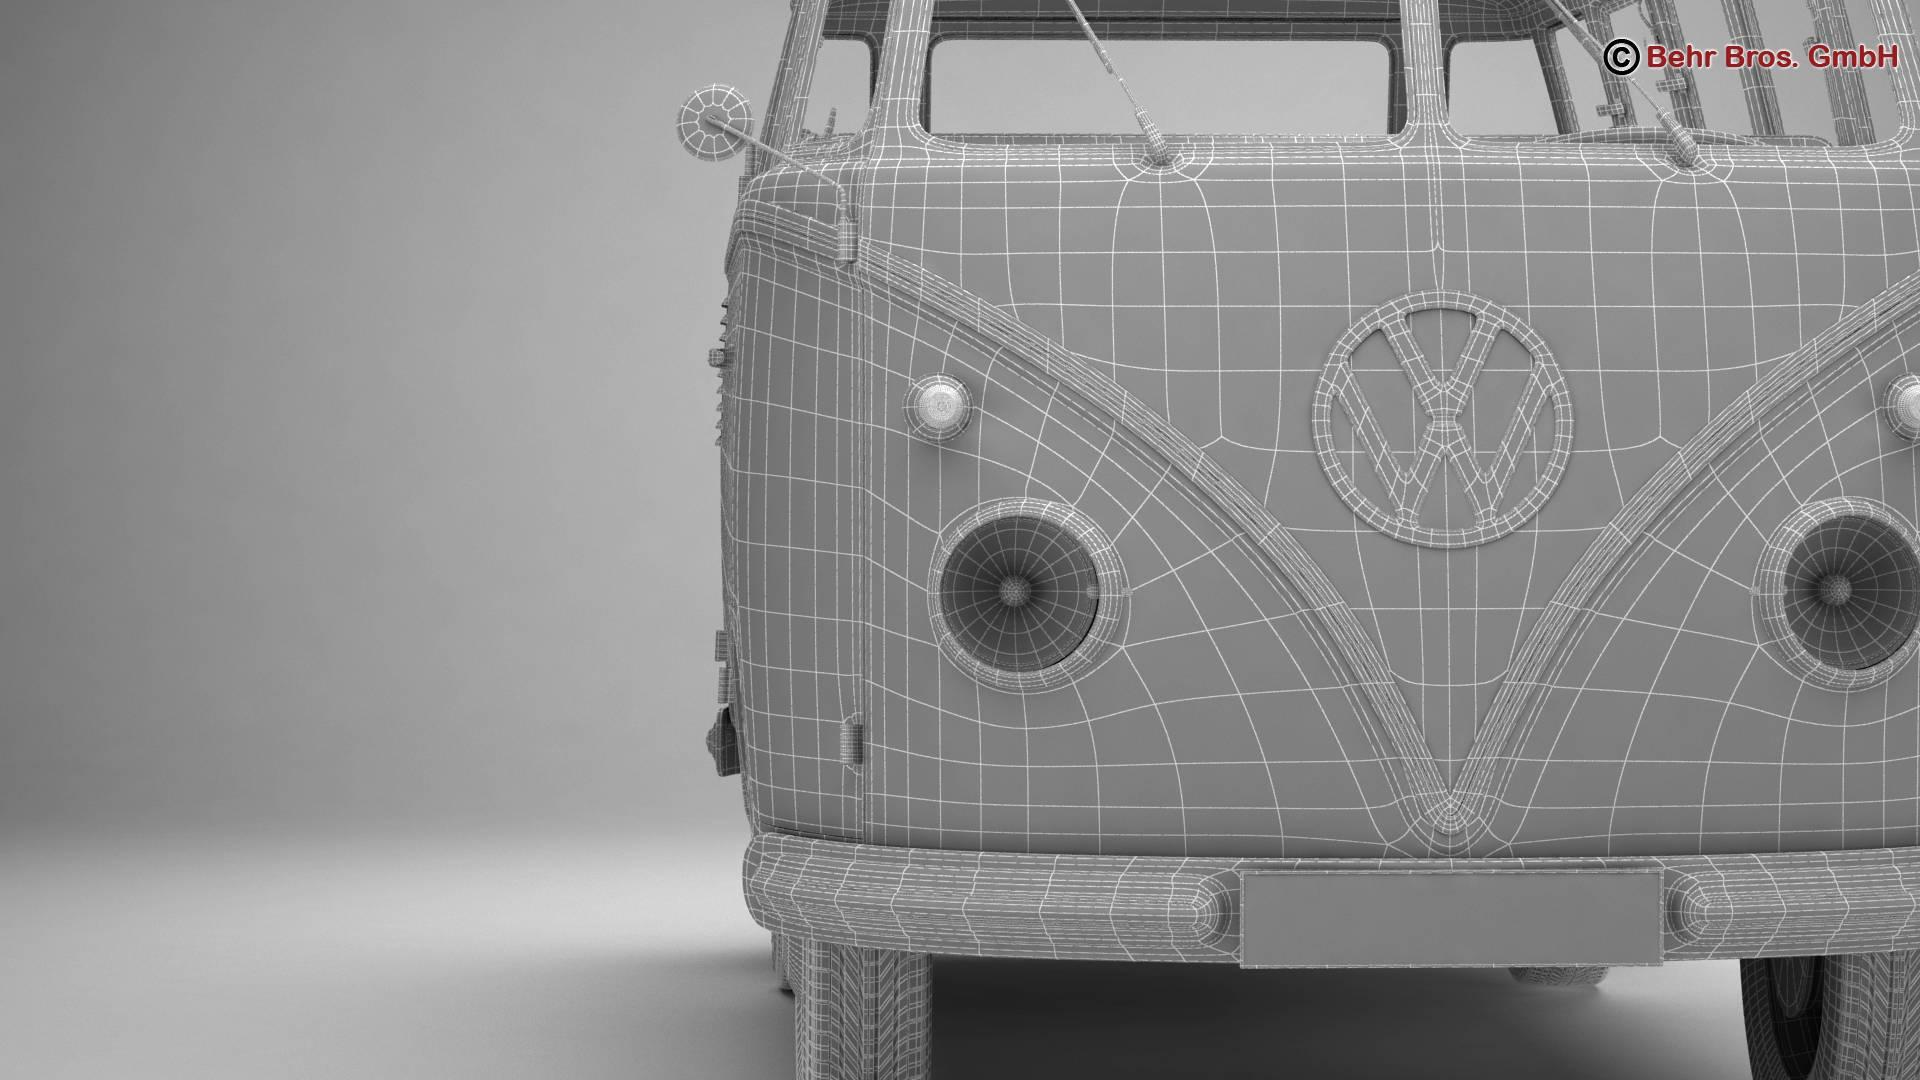 volkswagen type 2 samba 1959 3d model 3ds max fbx c4d lwo ma mb obj 217128